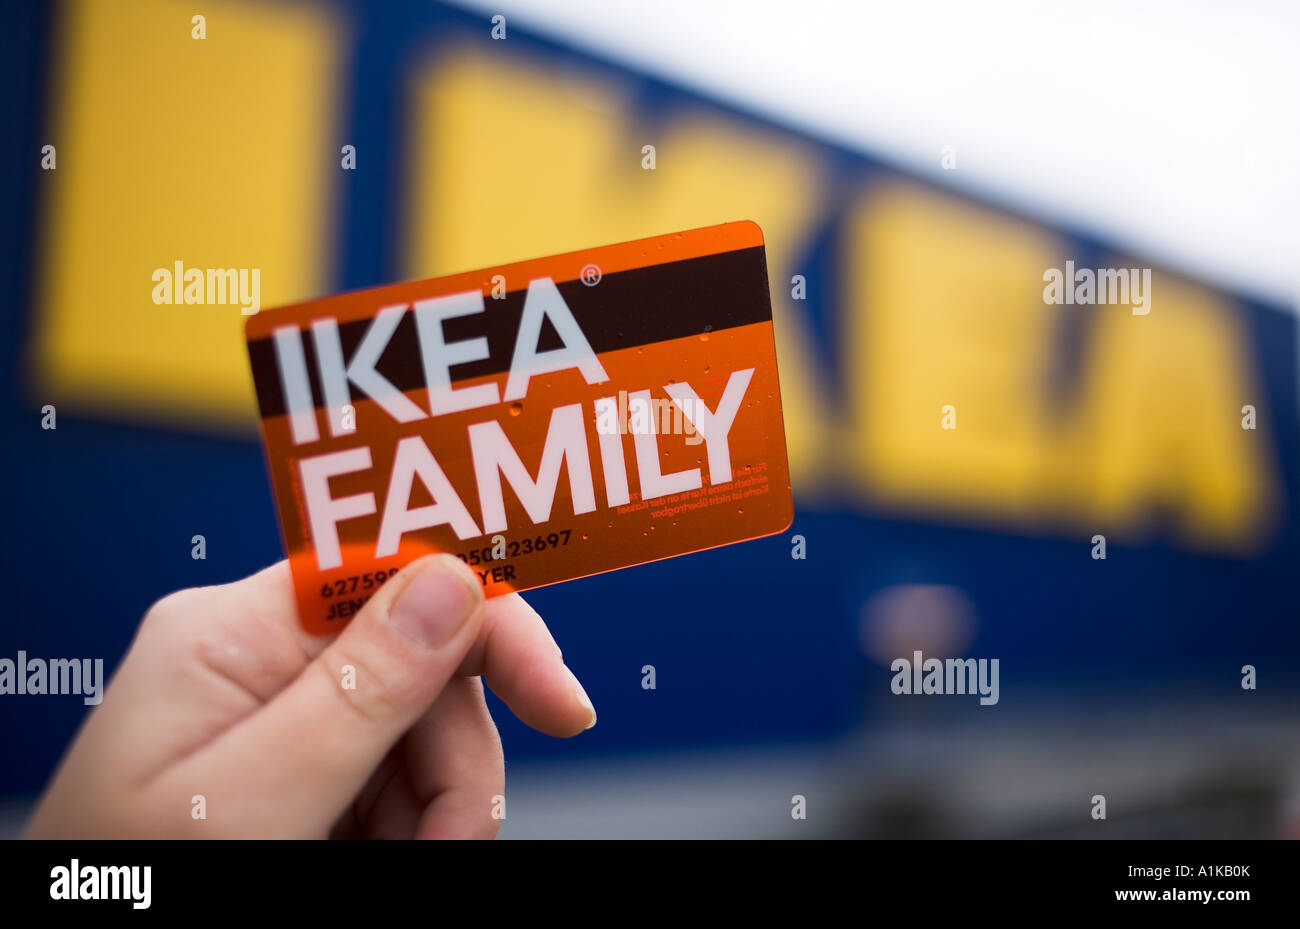 Ikea Family Card Stock Photos Ikea Family Card Stock Images Alamy